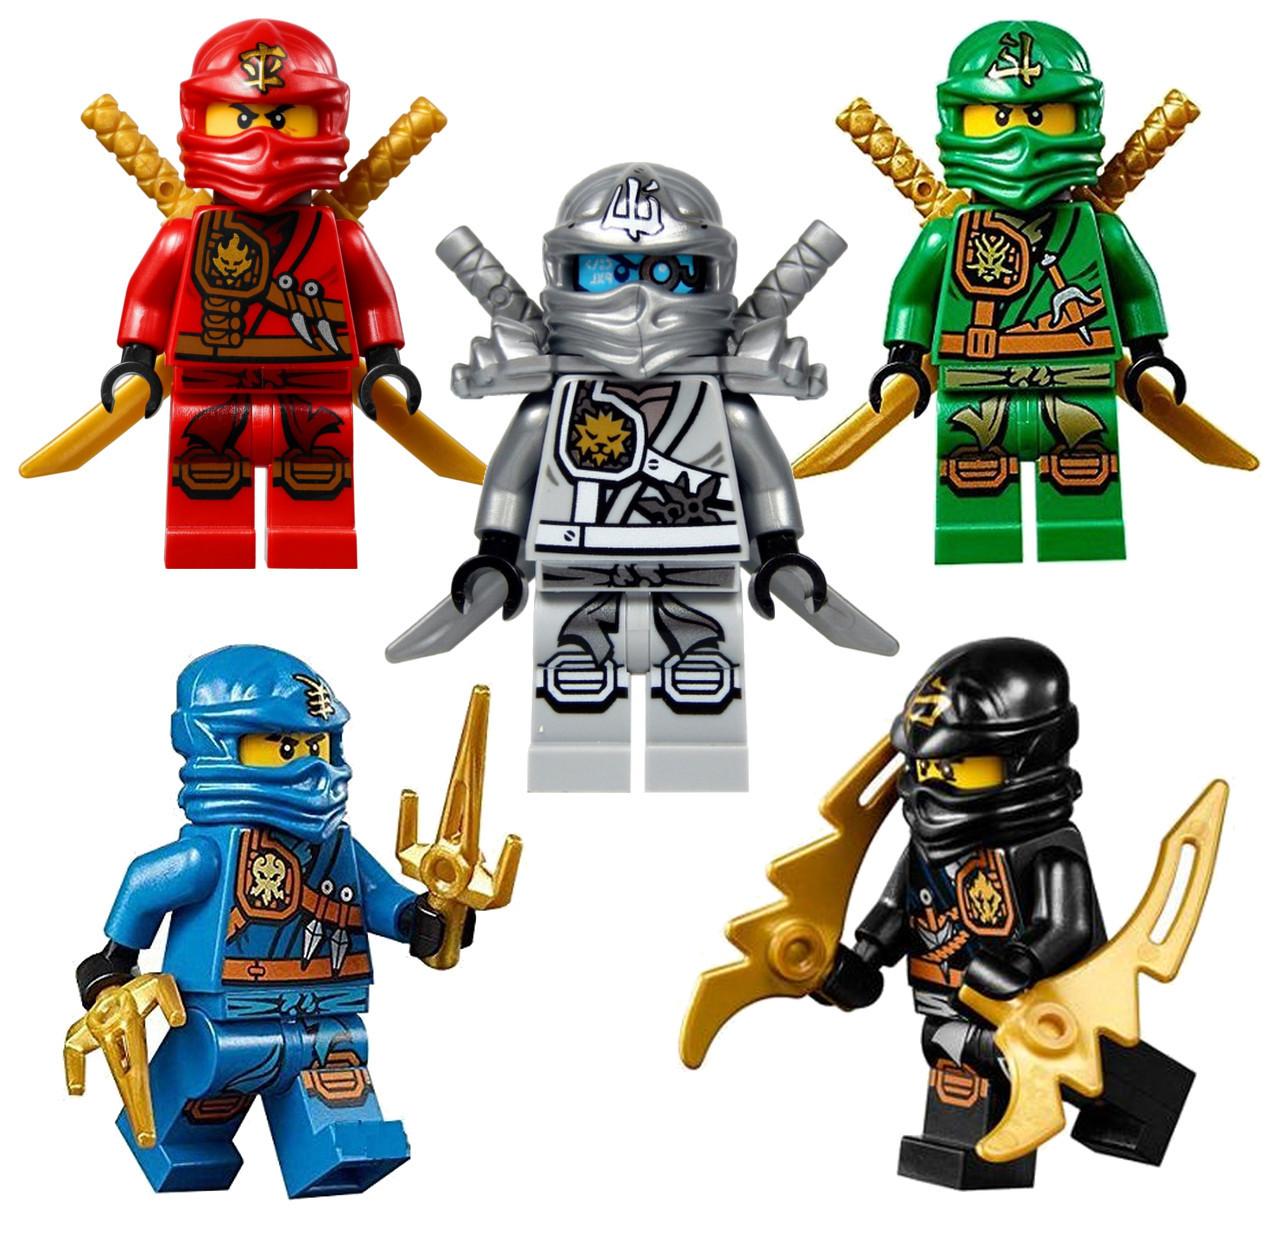 Weapons LEGO Ninjago Minifigures LOT Kai,Cole,Jay,Zane Villains